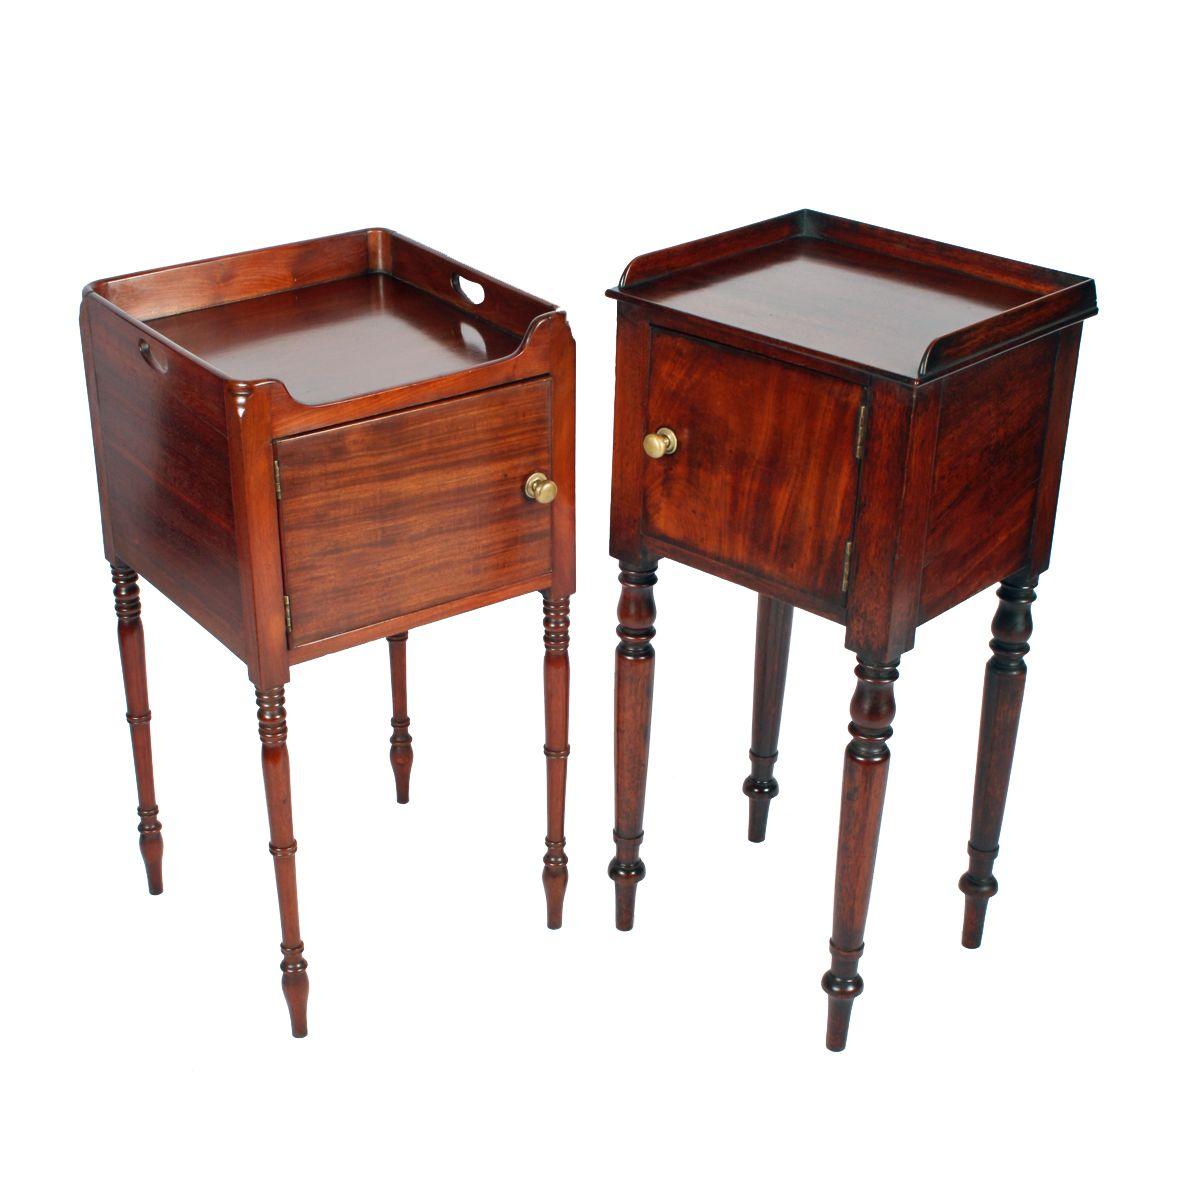 Two Georgian Bedside Cabinets